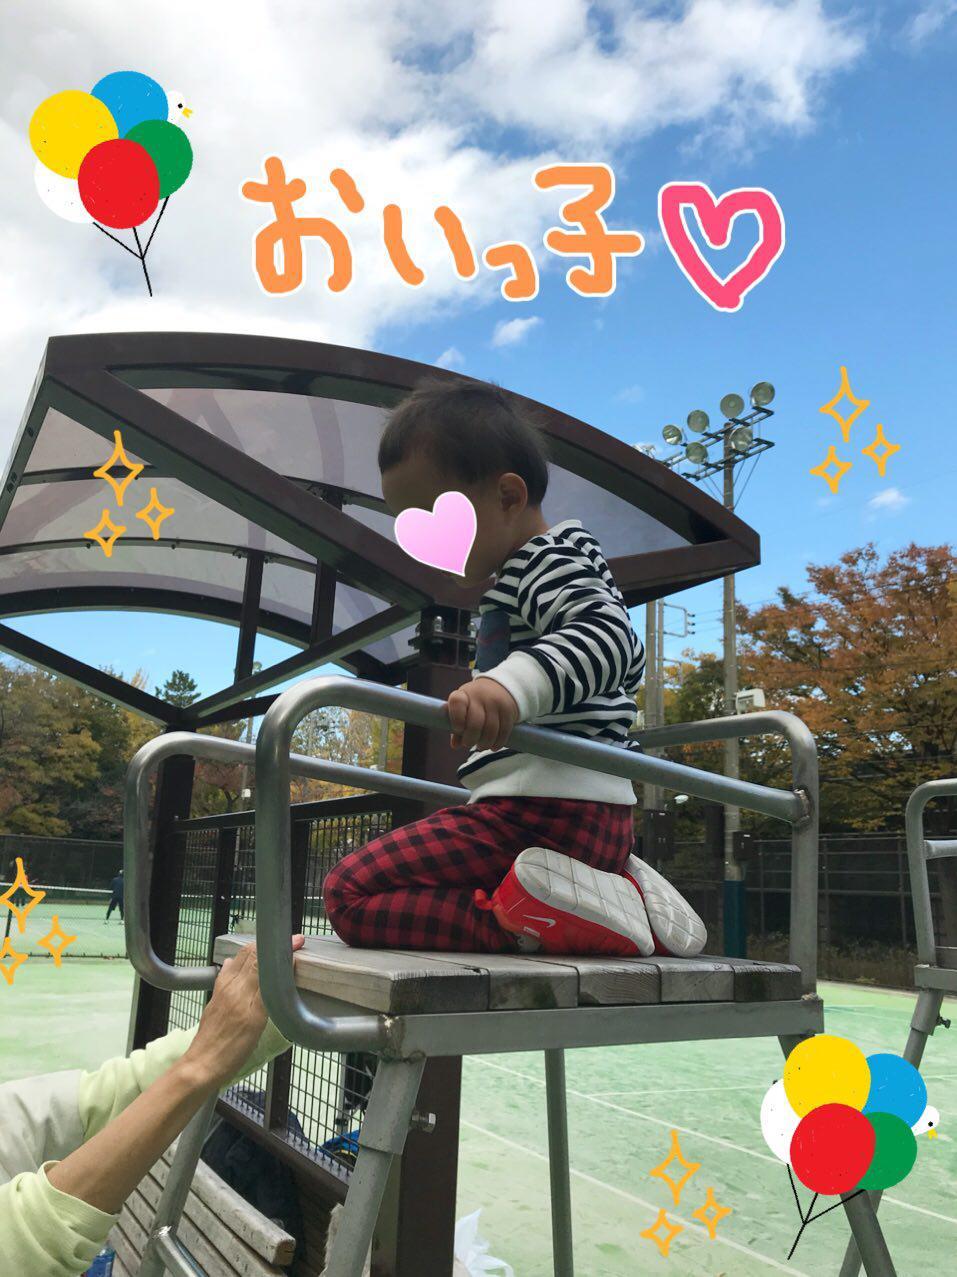 photo_2017-11-19_20-52-46.jpg